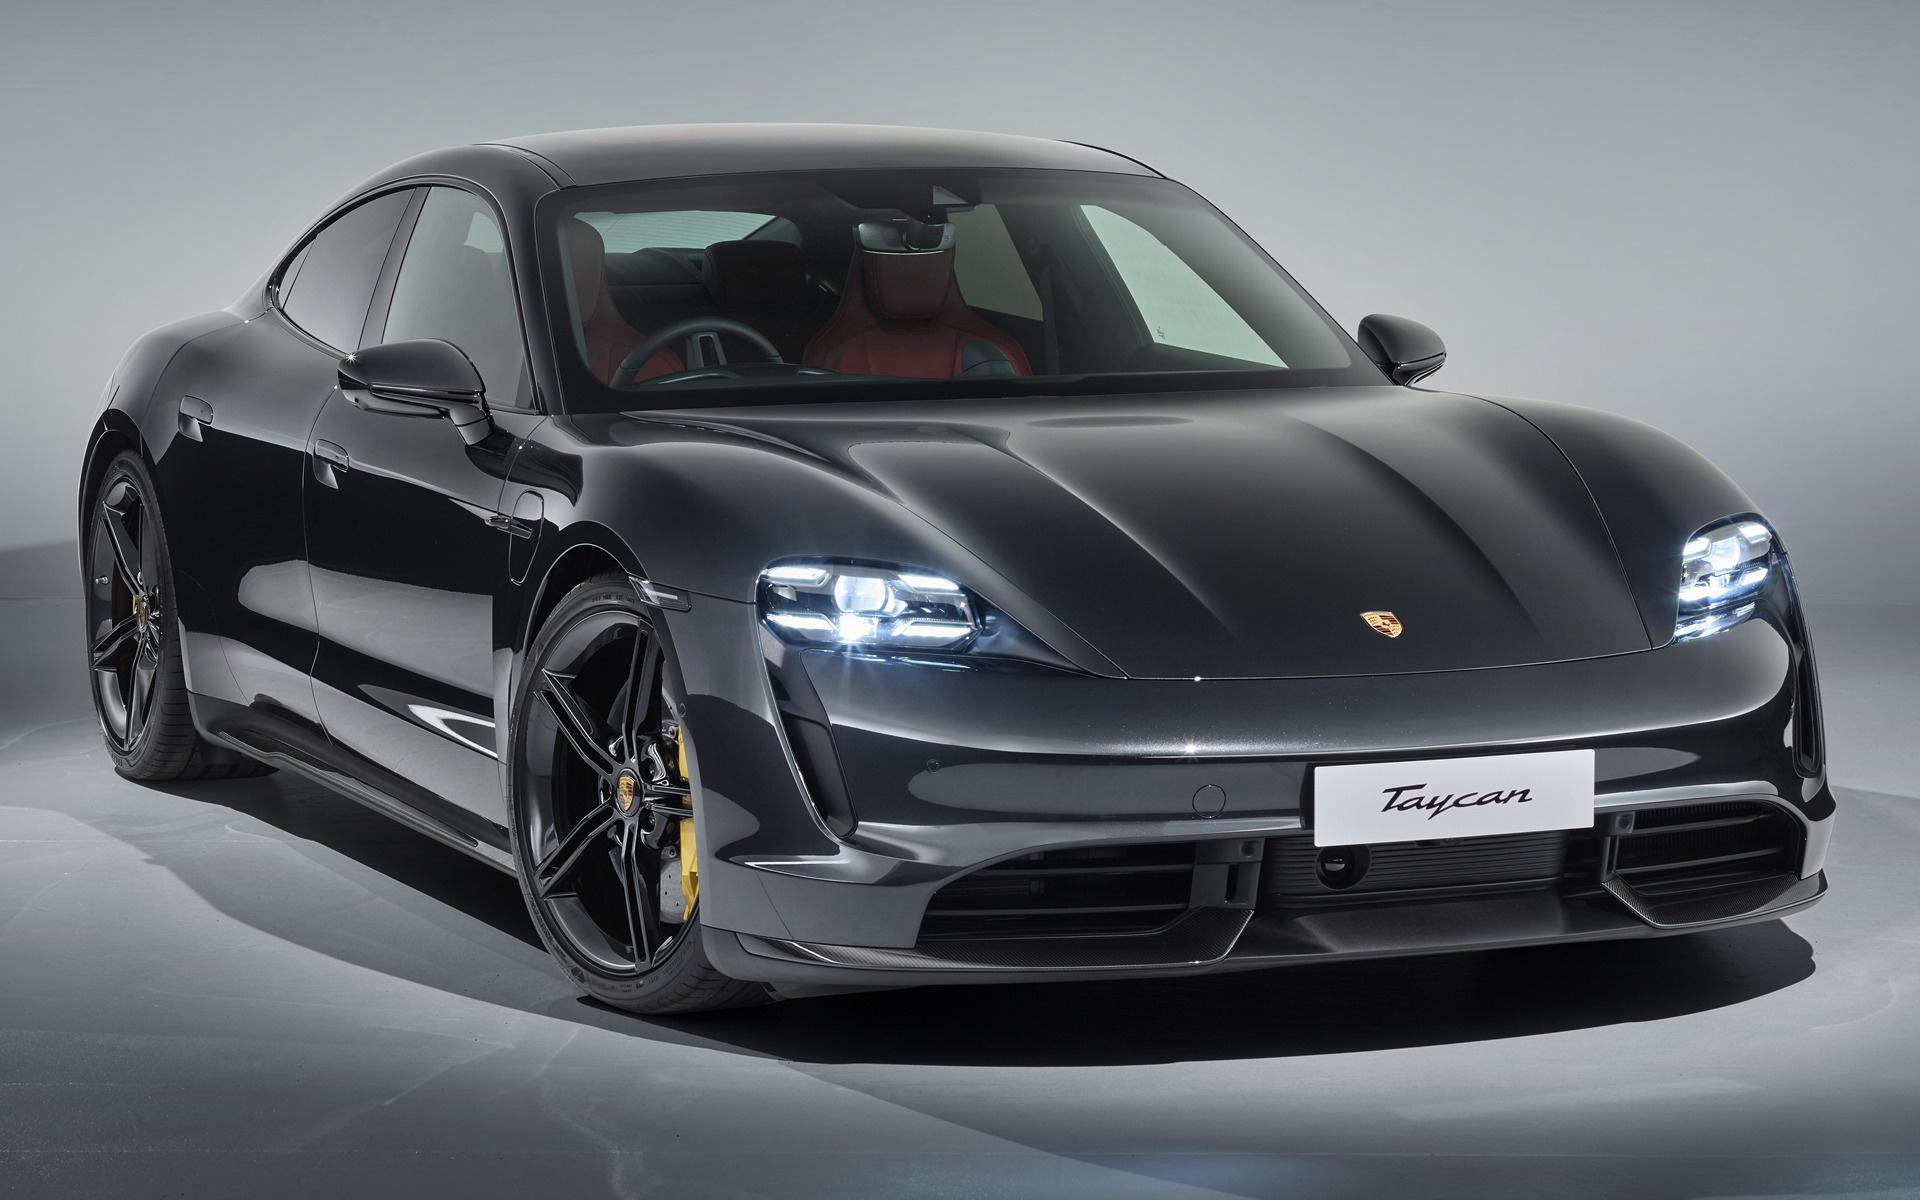 2020 Porsche Taycan Turbo S Au Papeis De Parede E Imagens De Fundo Em Hd Car Pixel